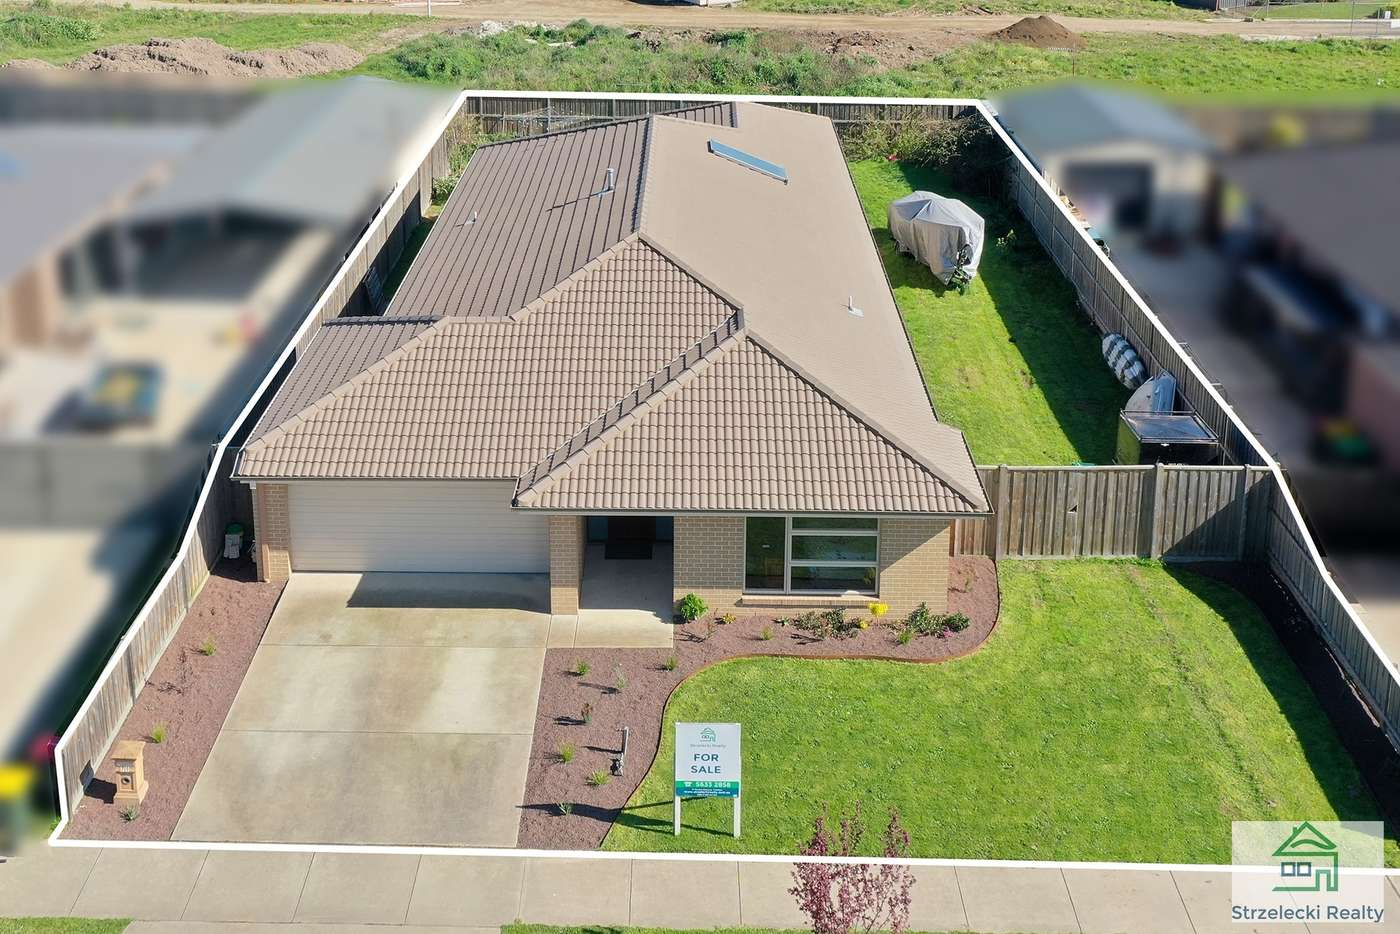 Main view of Homely house listing, 71 Davey Drive, Trafalgar VIC 3824